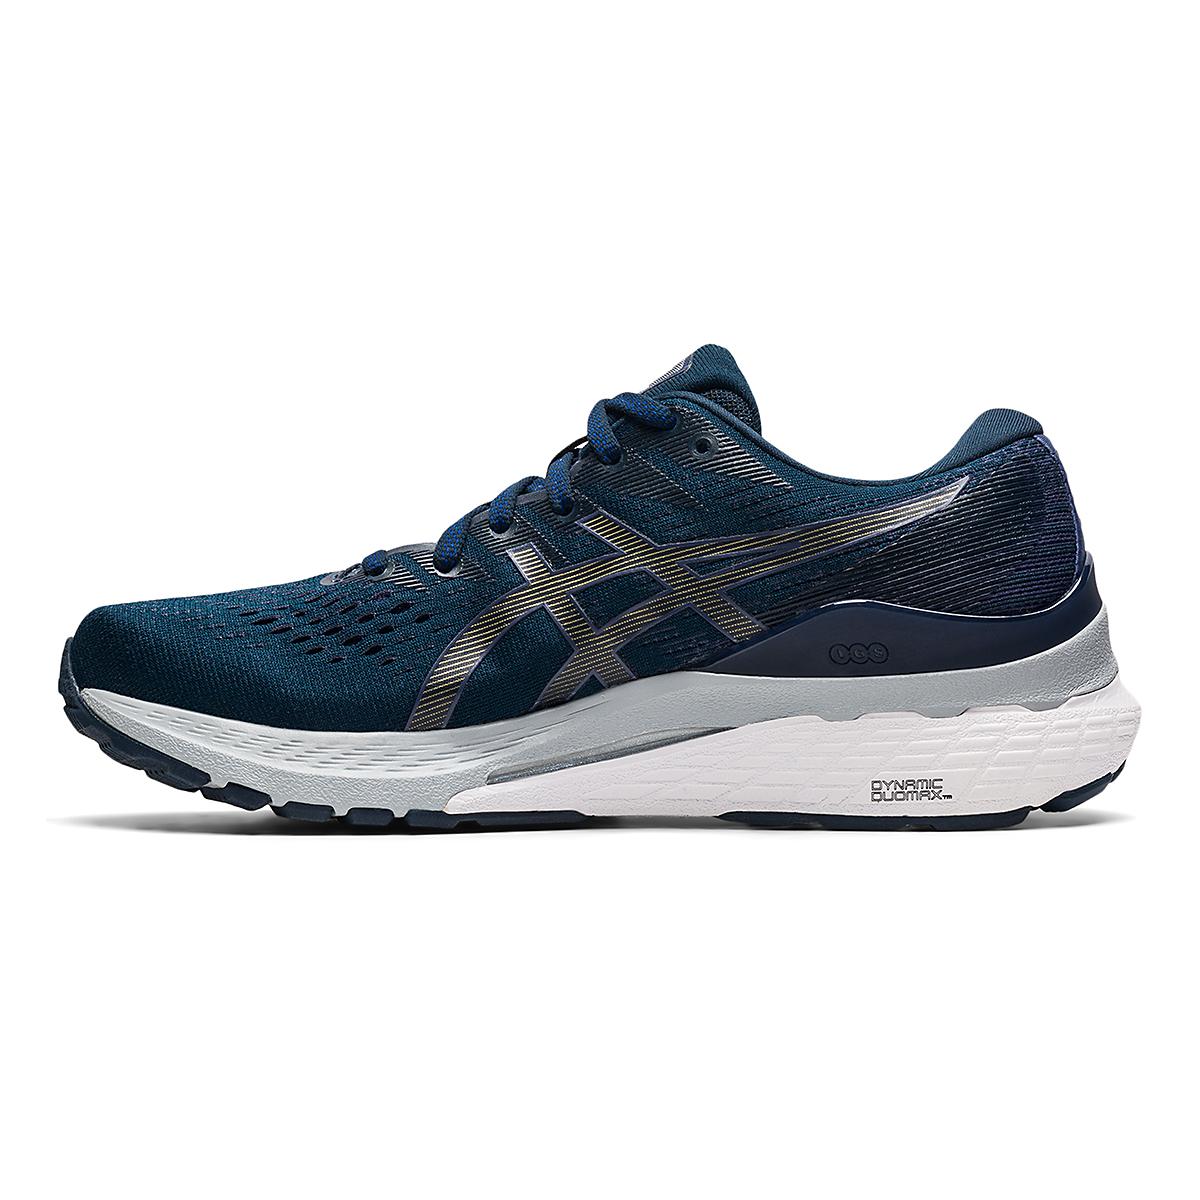 Women's Asics Gel-Kayano 28 Running Shoe - Color: French Blue/Thunder Blue - Size: 5 - Width: Wide, French Blue/Thunder Blue, large, image 2